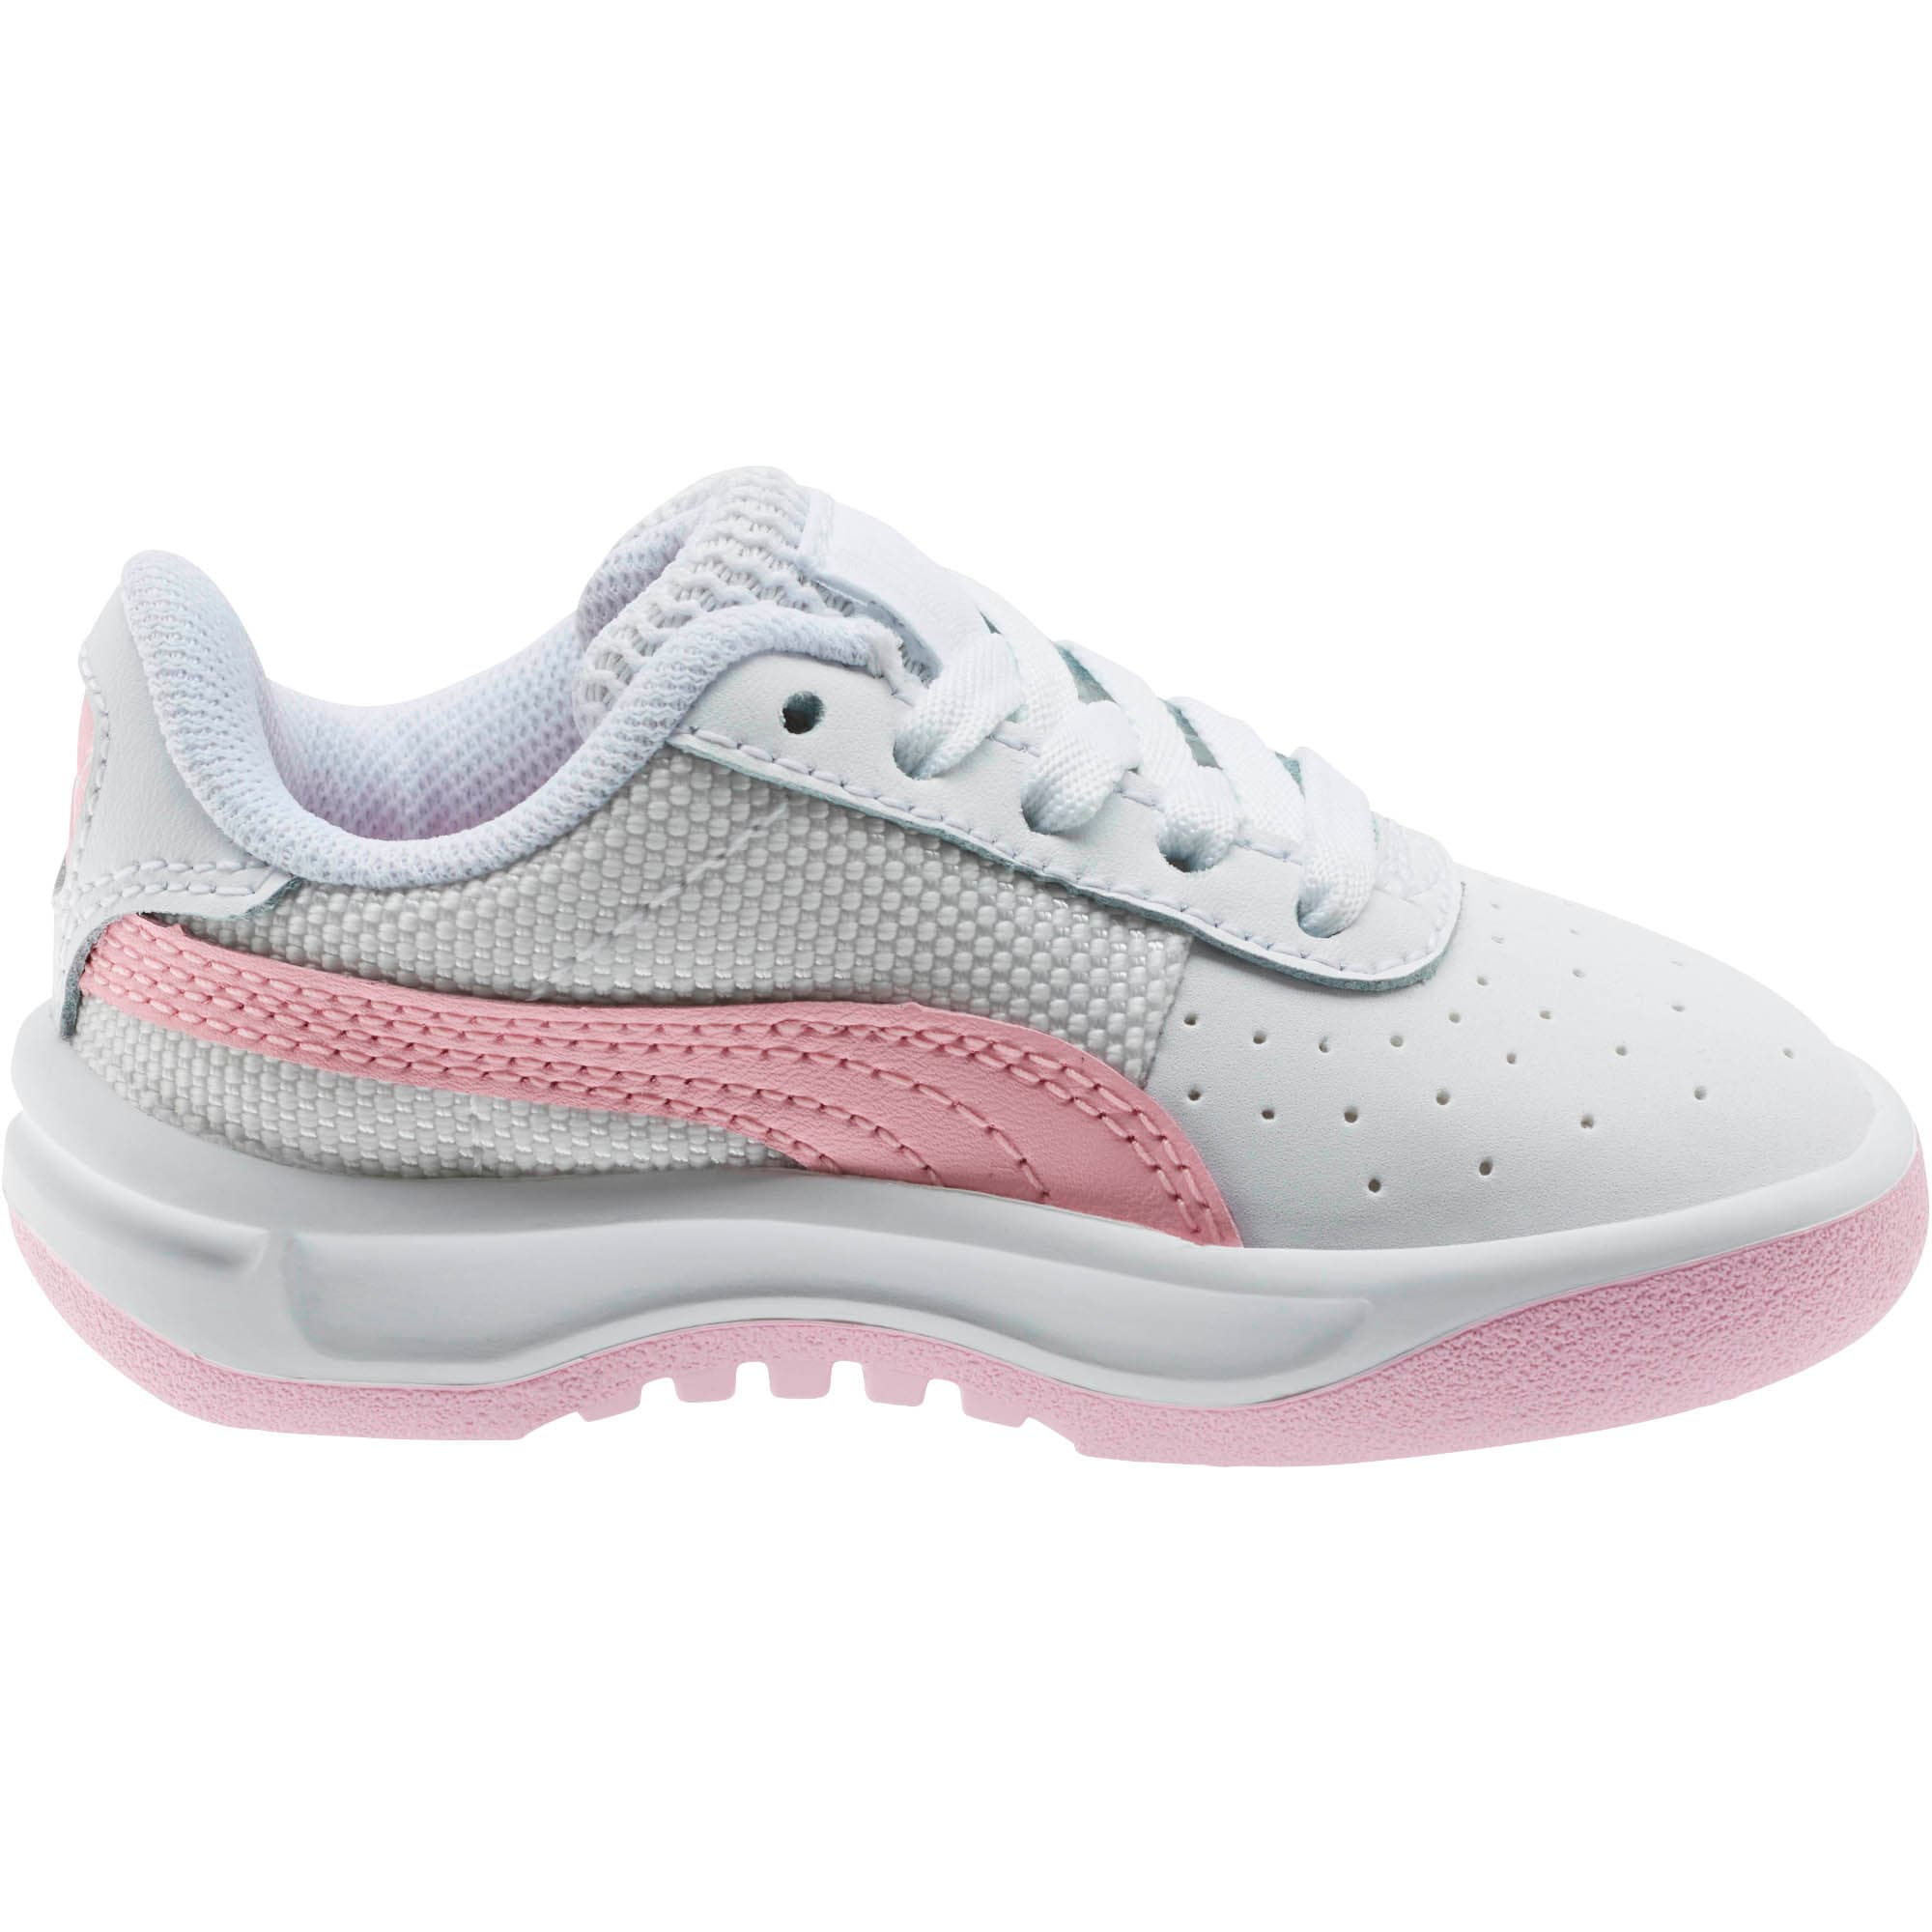 Thumbnail 4 of California Toddler Shoes, Puma Wht-Pale Pink-Puma Wht, medium